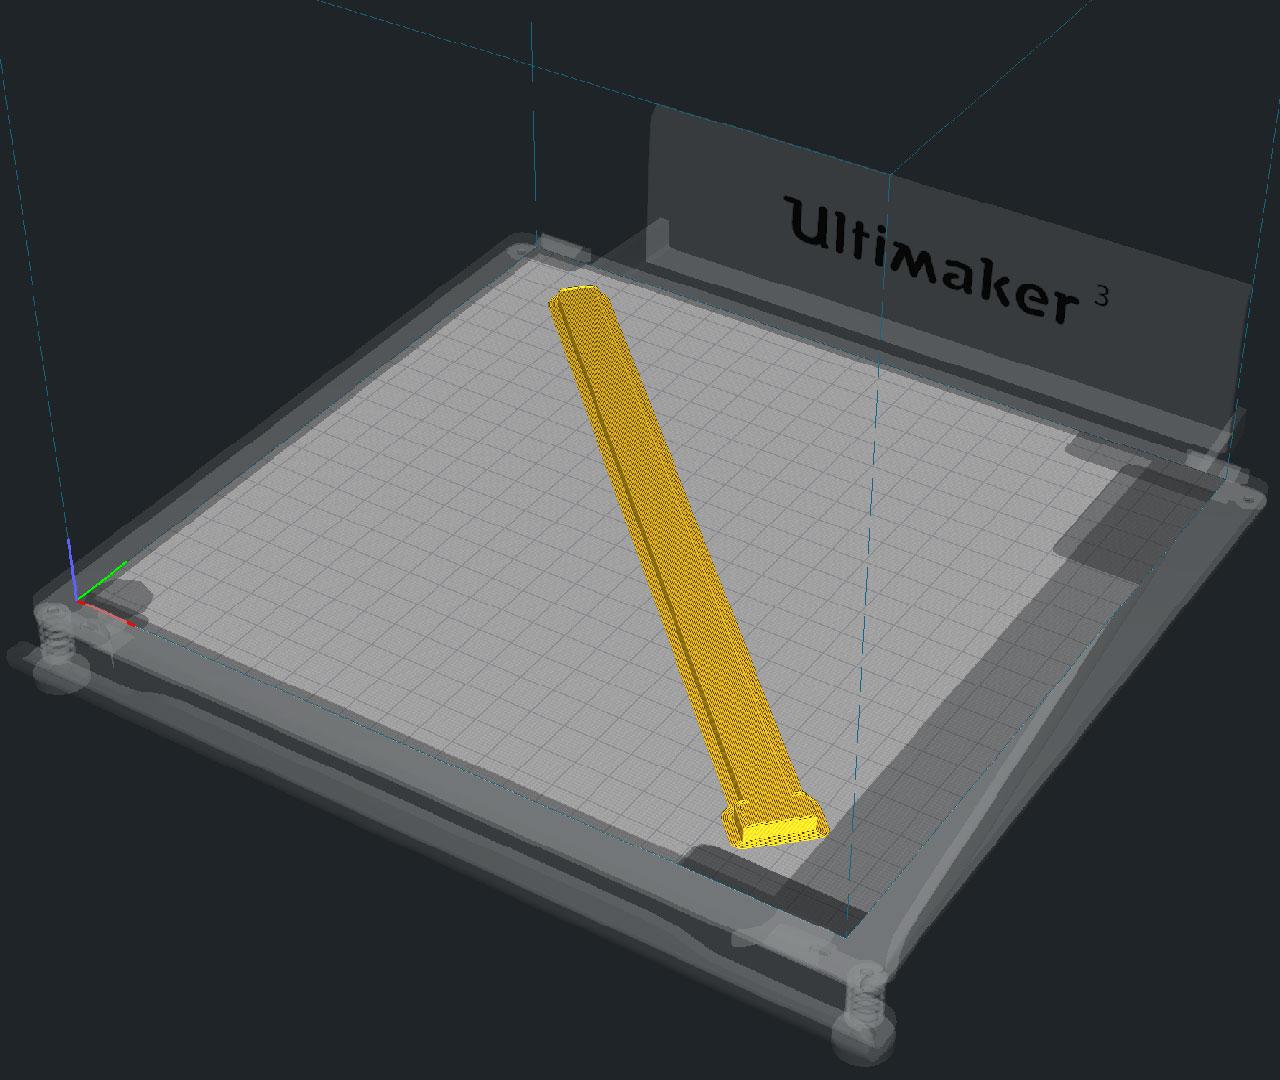 3d_printing_stick-on-bed.jpg